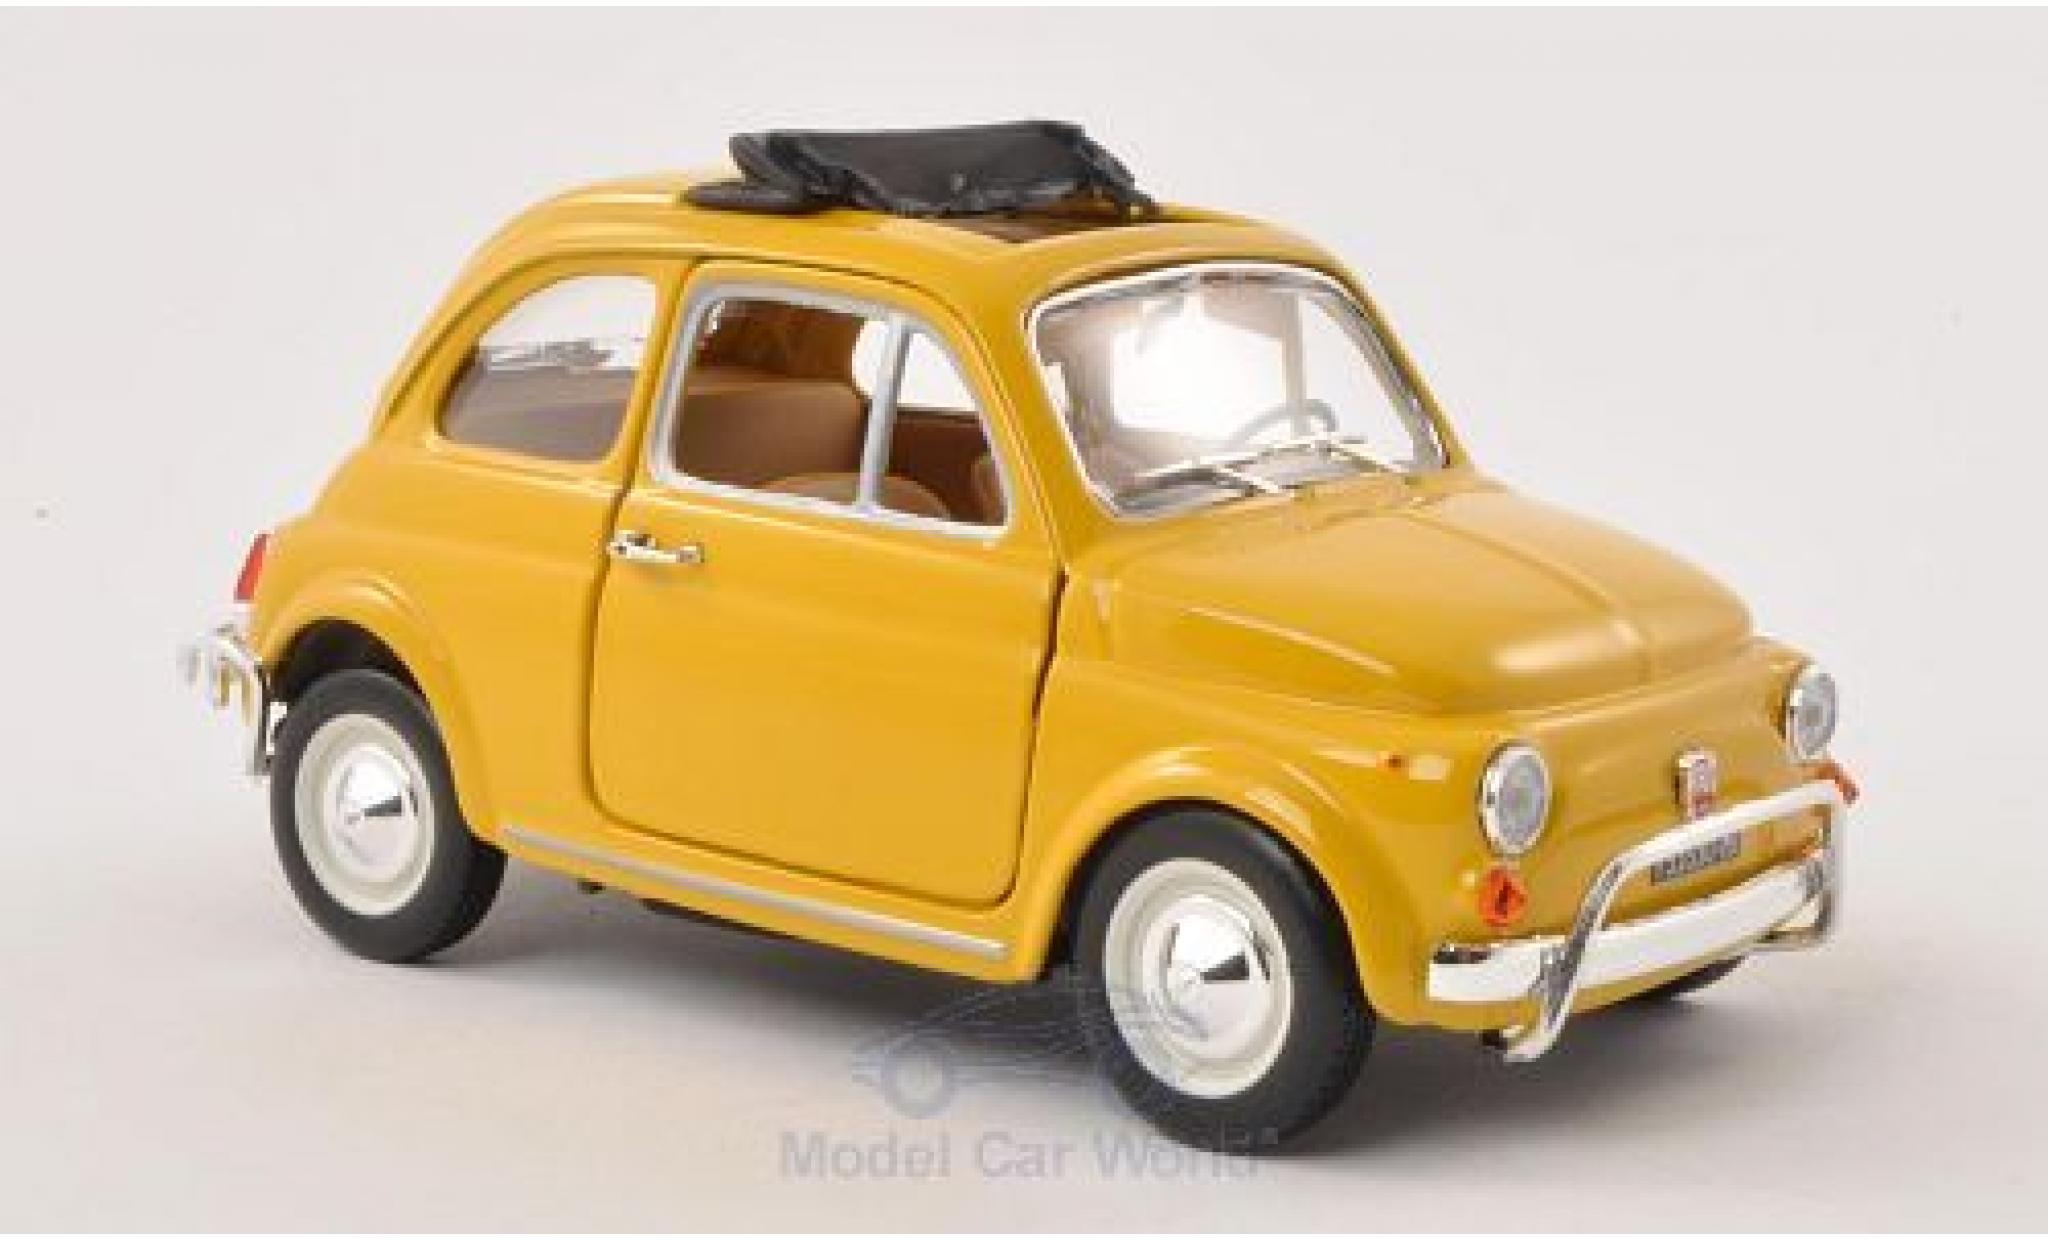 Fiat 500 1/24 Bburago L jaune 1968 geöffnetes Faltdach ohne Vitrine